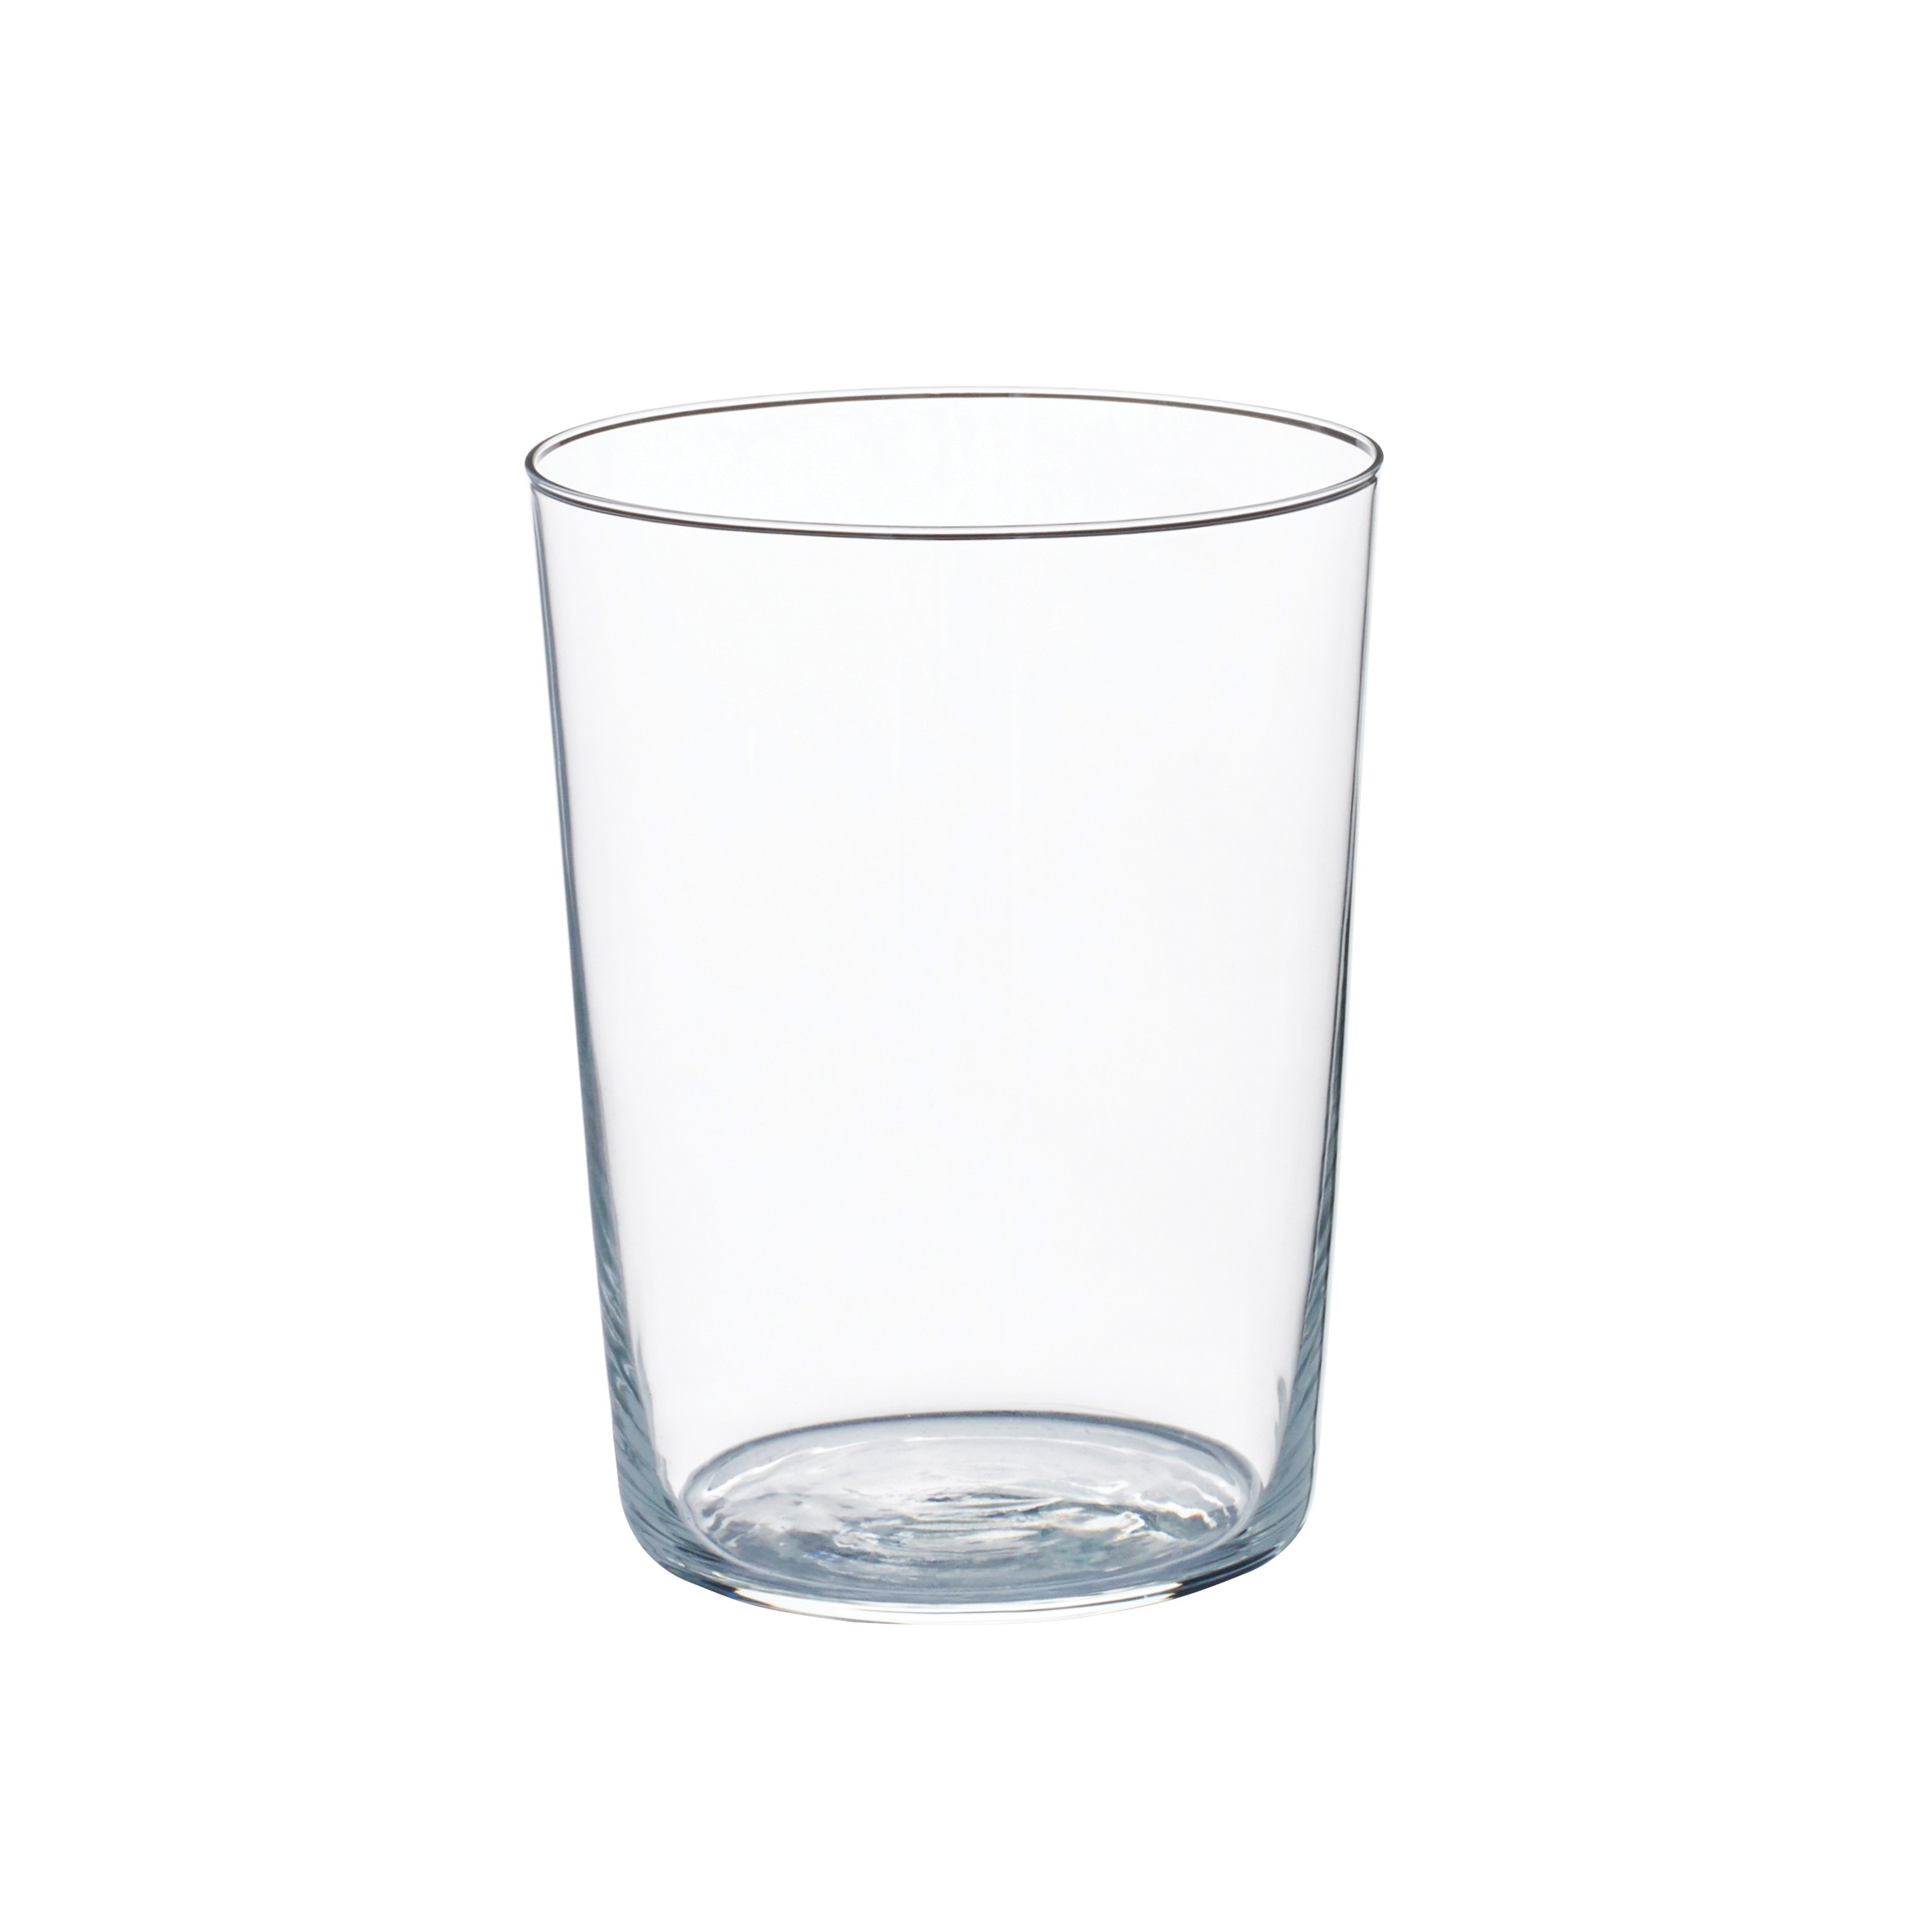 large-glass.jpg